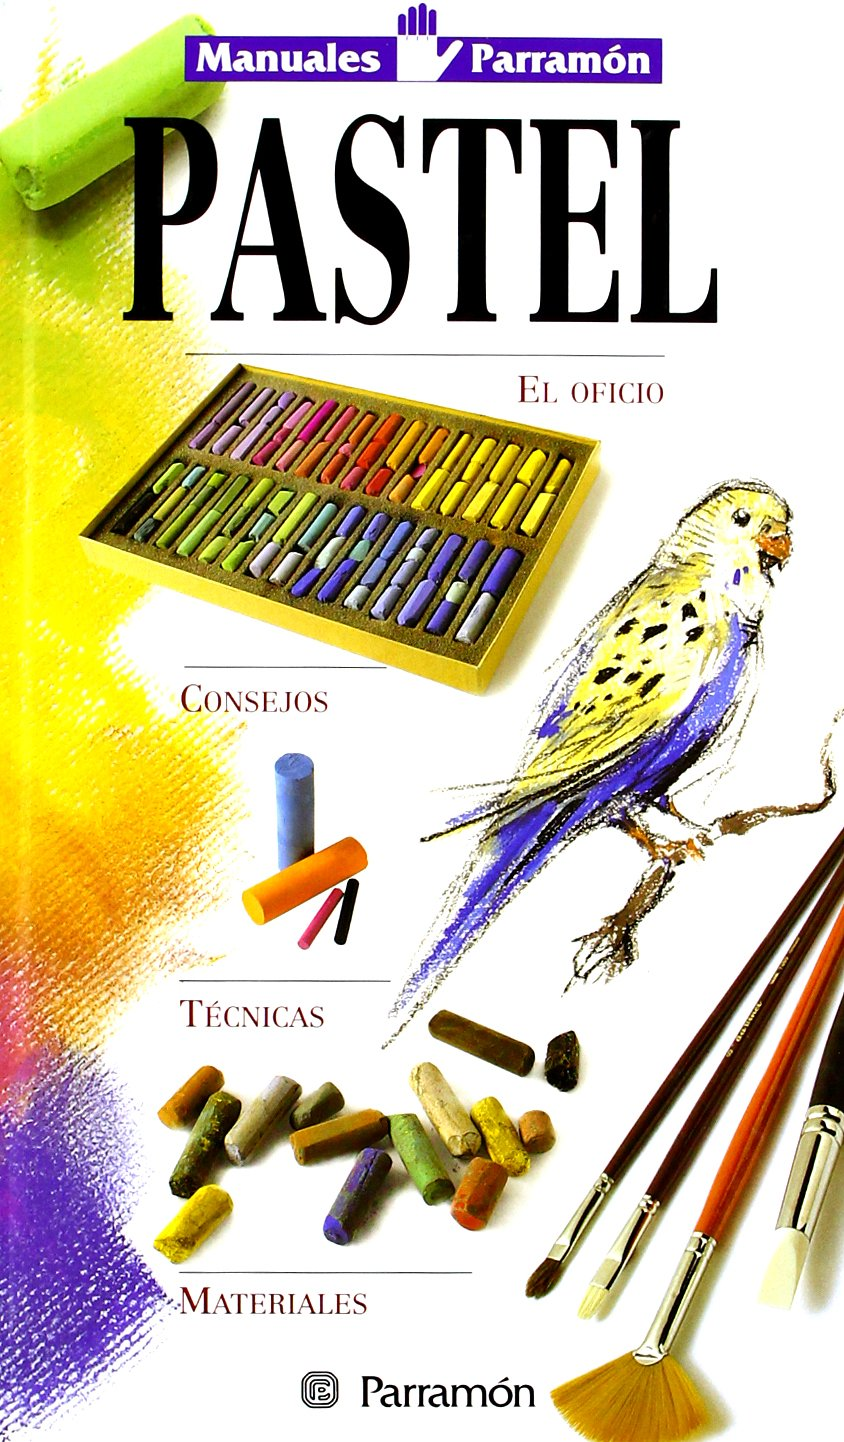 Manuales parramon tecnicas pastel (Spanish Edition)